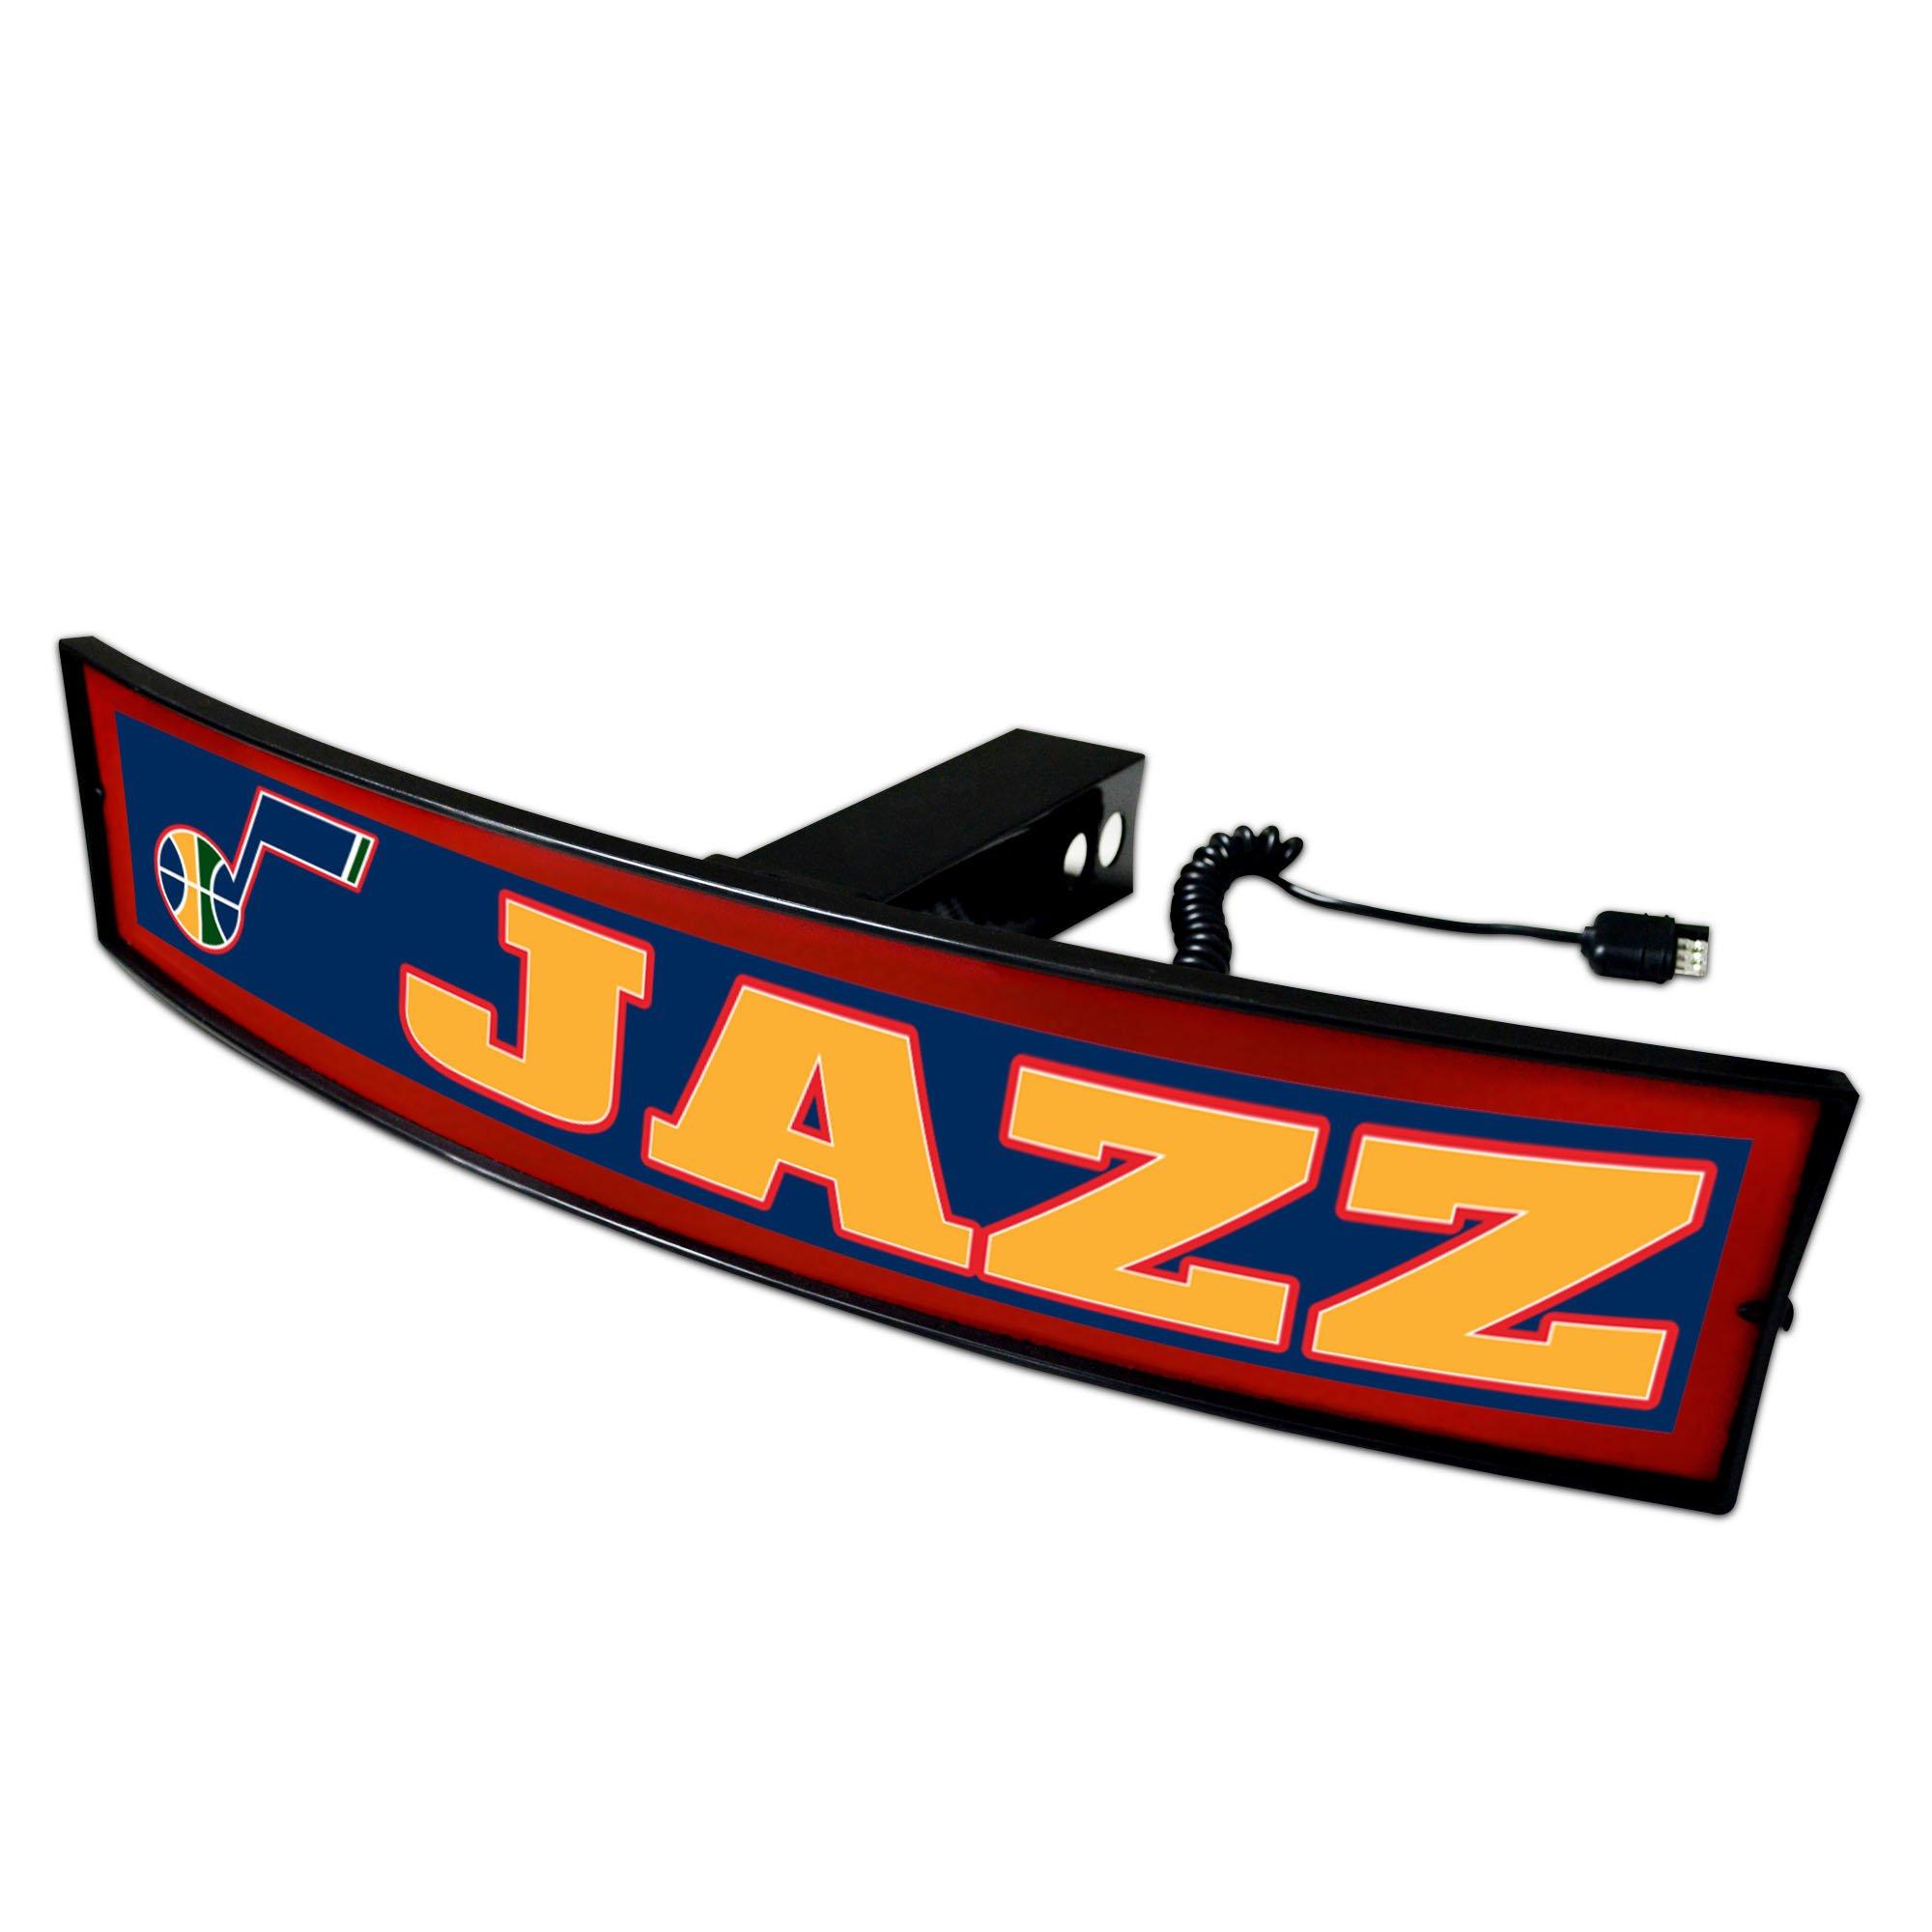 CC Sports Decor NBA - Utah Jazz Light Up Hitch Cover - 21''x9.5''